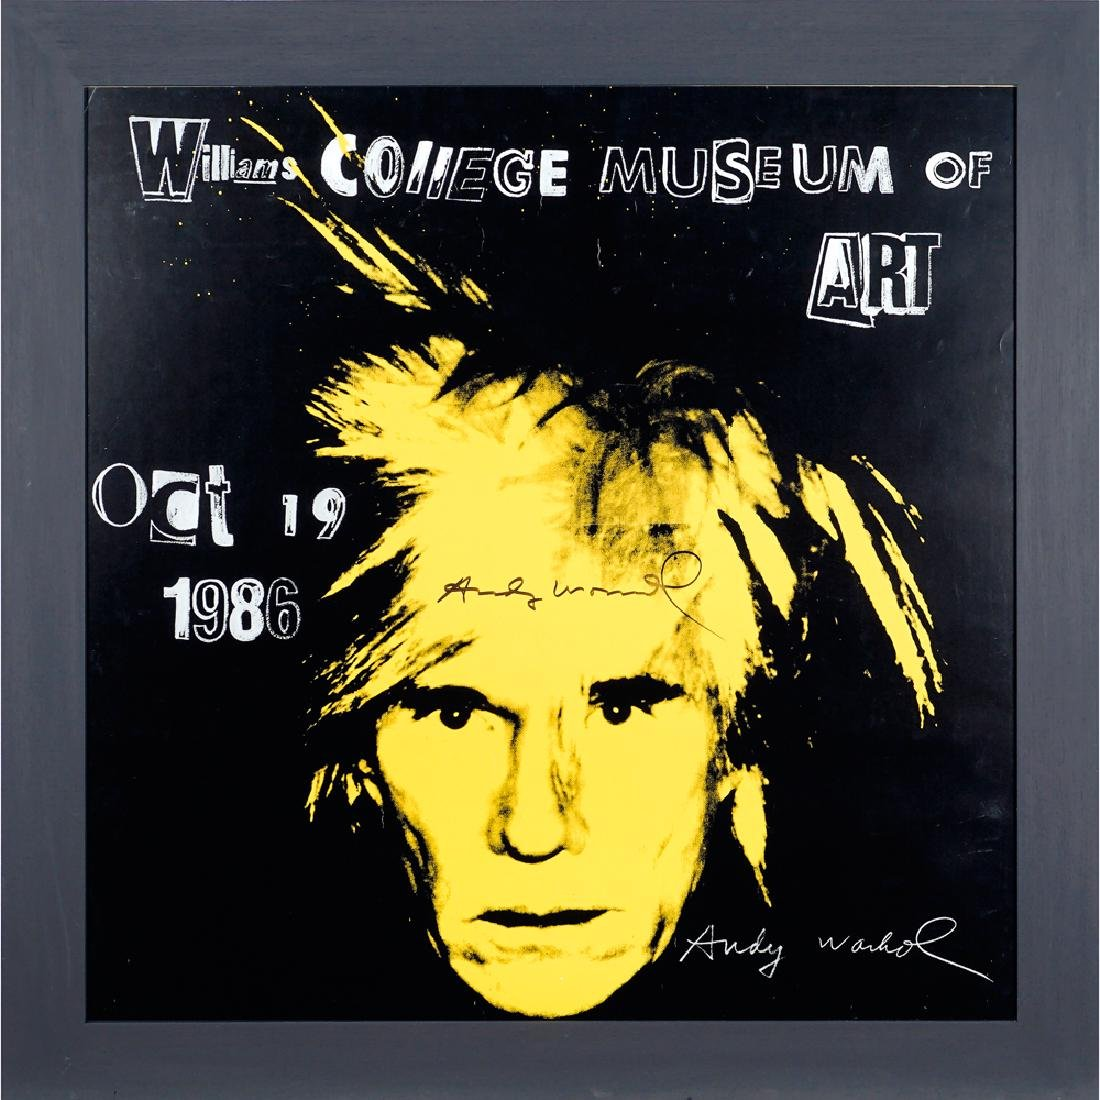 Andy Warhol Pittsburgh 1928 1928 - New York 1987 86